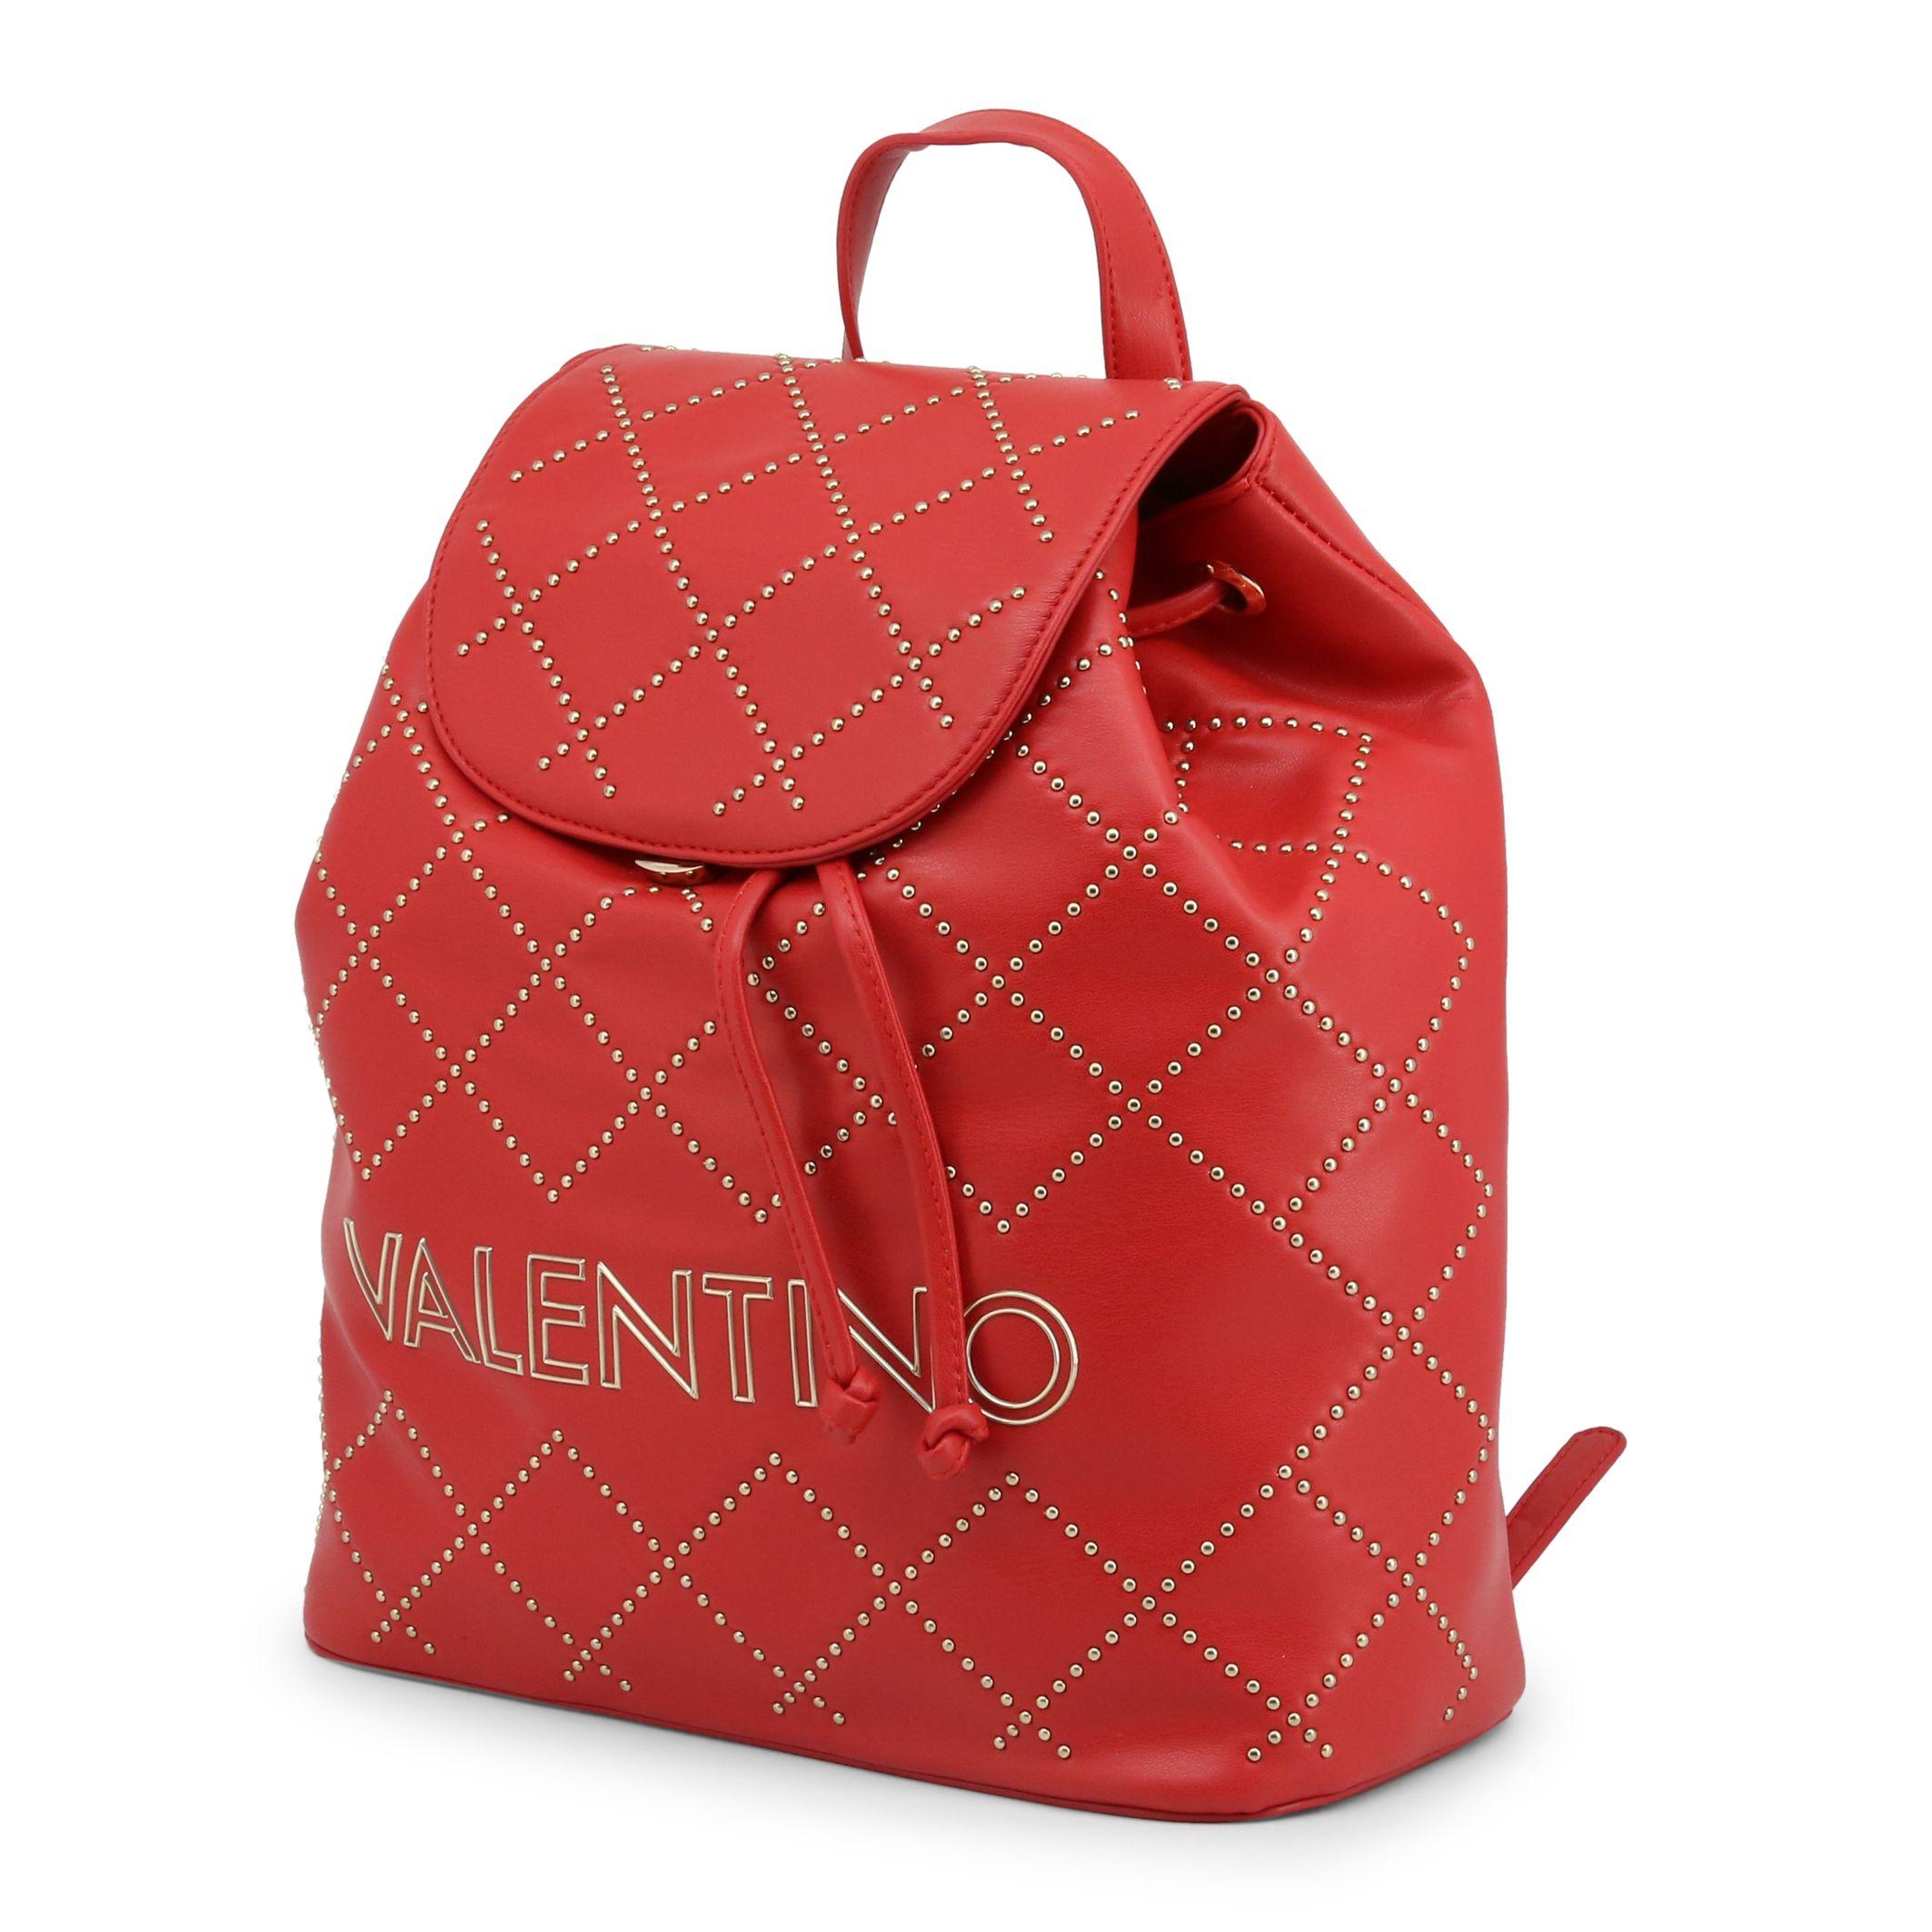 Valentino by Mario Valentino – VBS3KI02